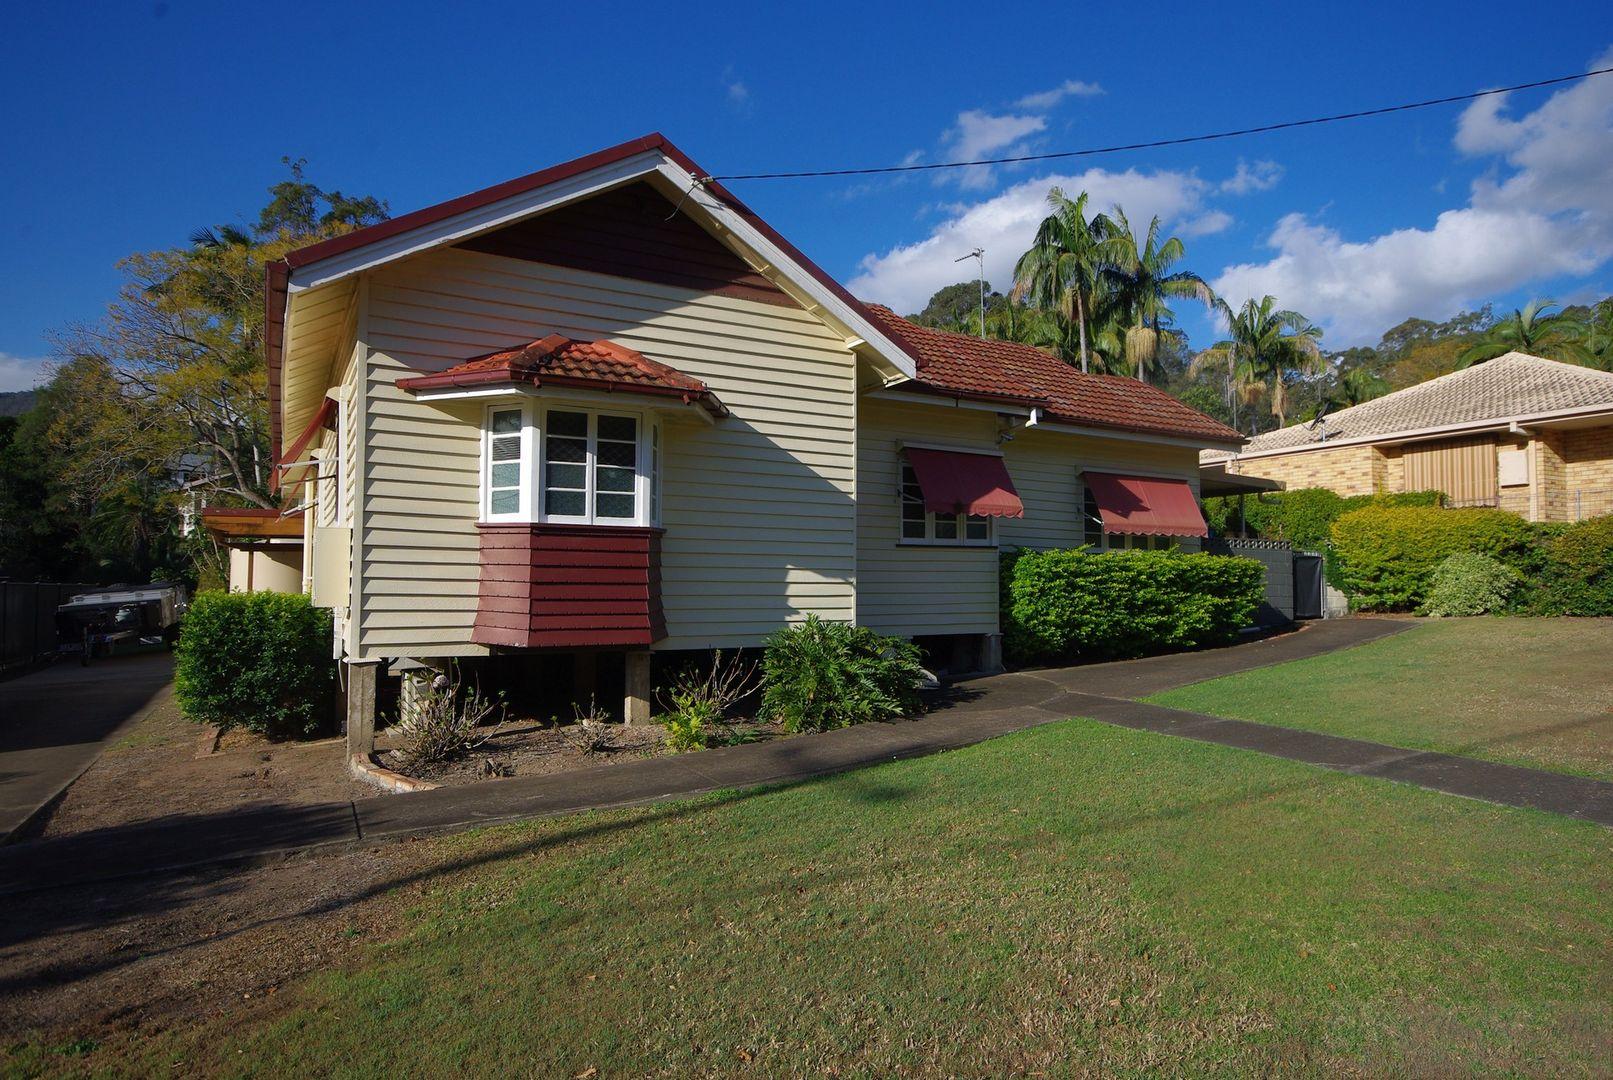 36-38 Appel Street, Canungra QLD 4275, Image 0